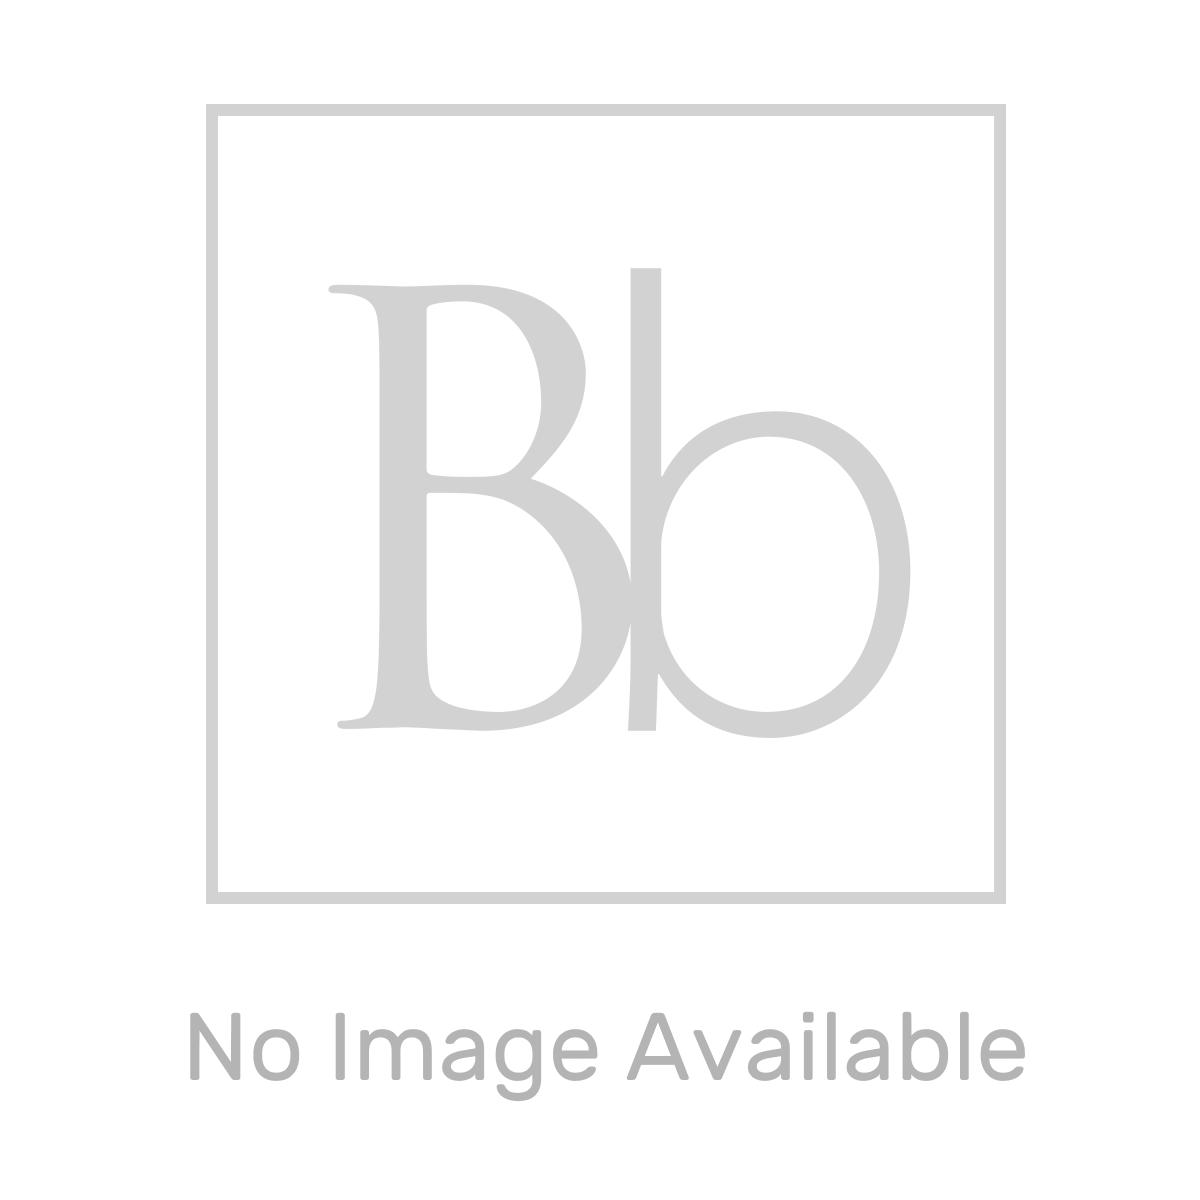 Sanifloor 3 Macerator Pump for Shower Wastes